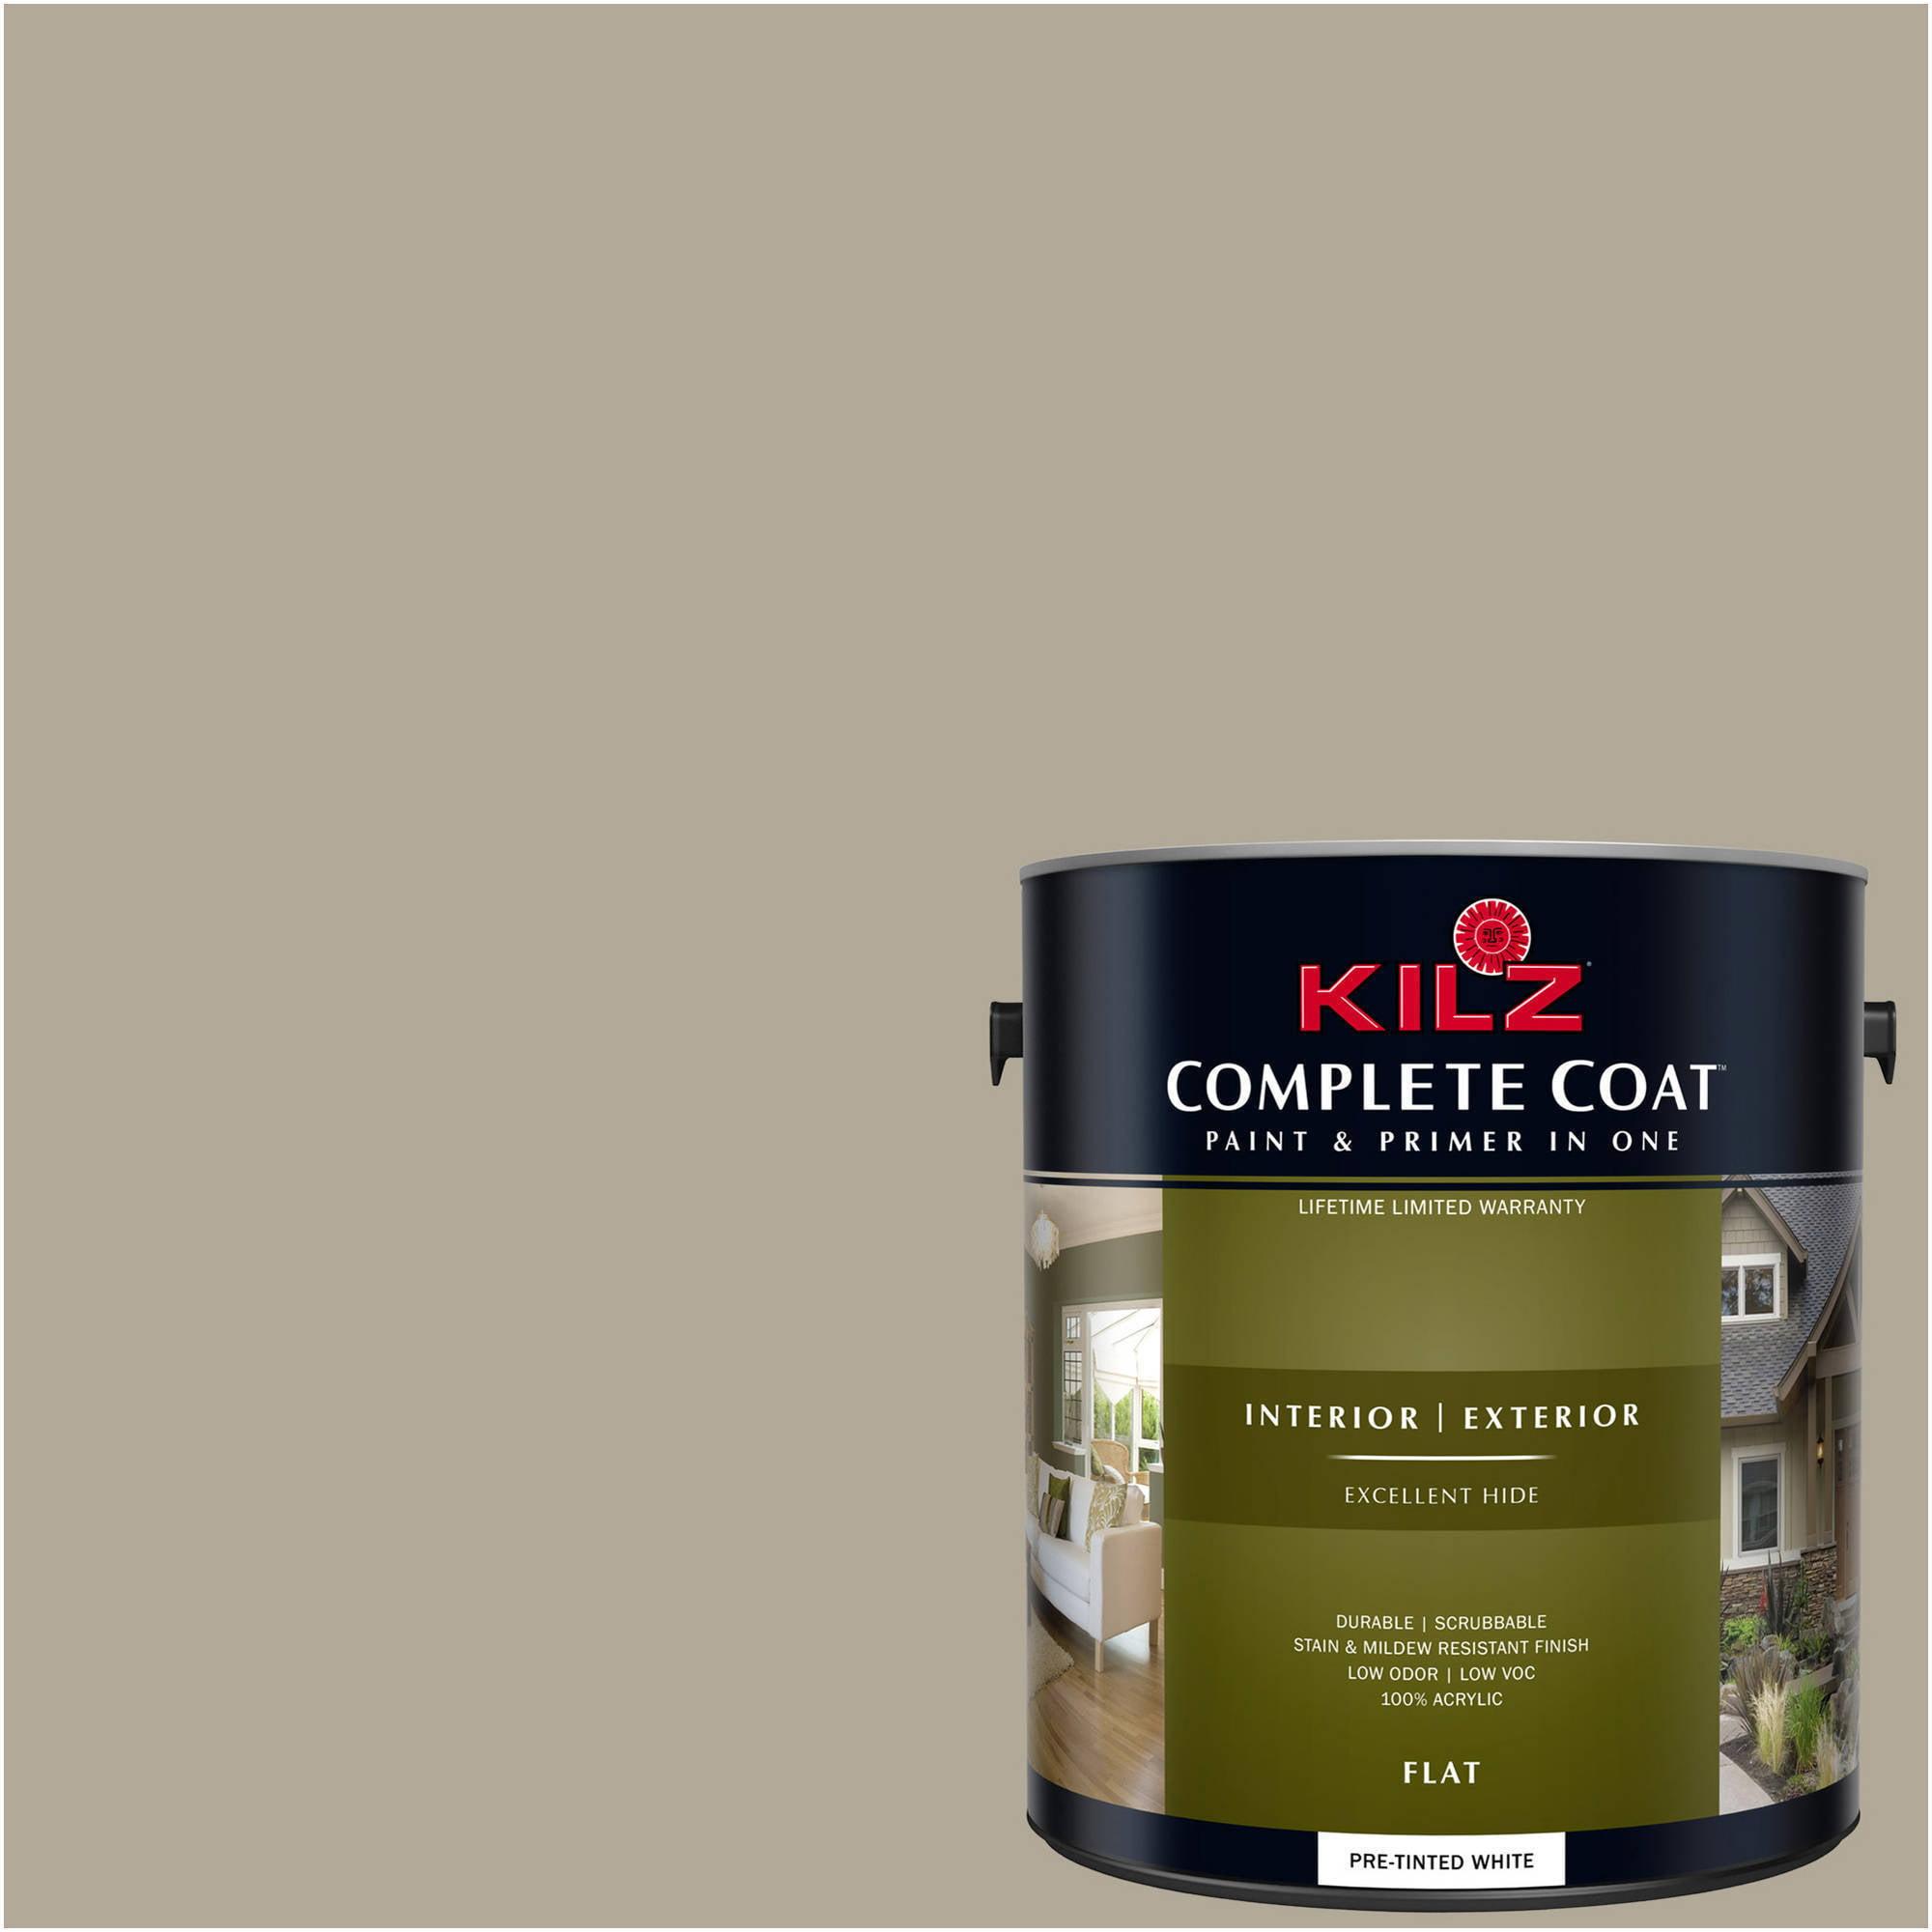 KILZ COMPLETE COAT Interior/Exterior Paint & Primer in One #LL220 Khaki